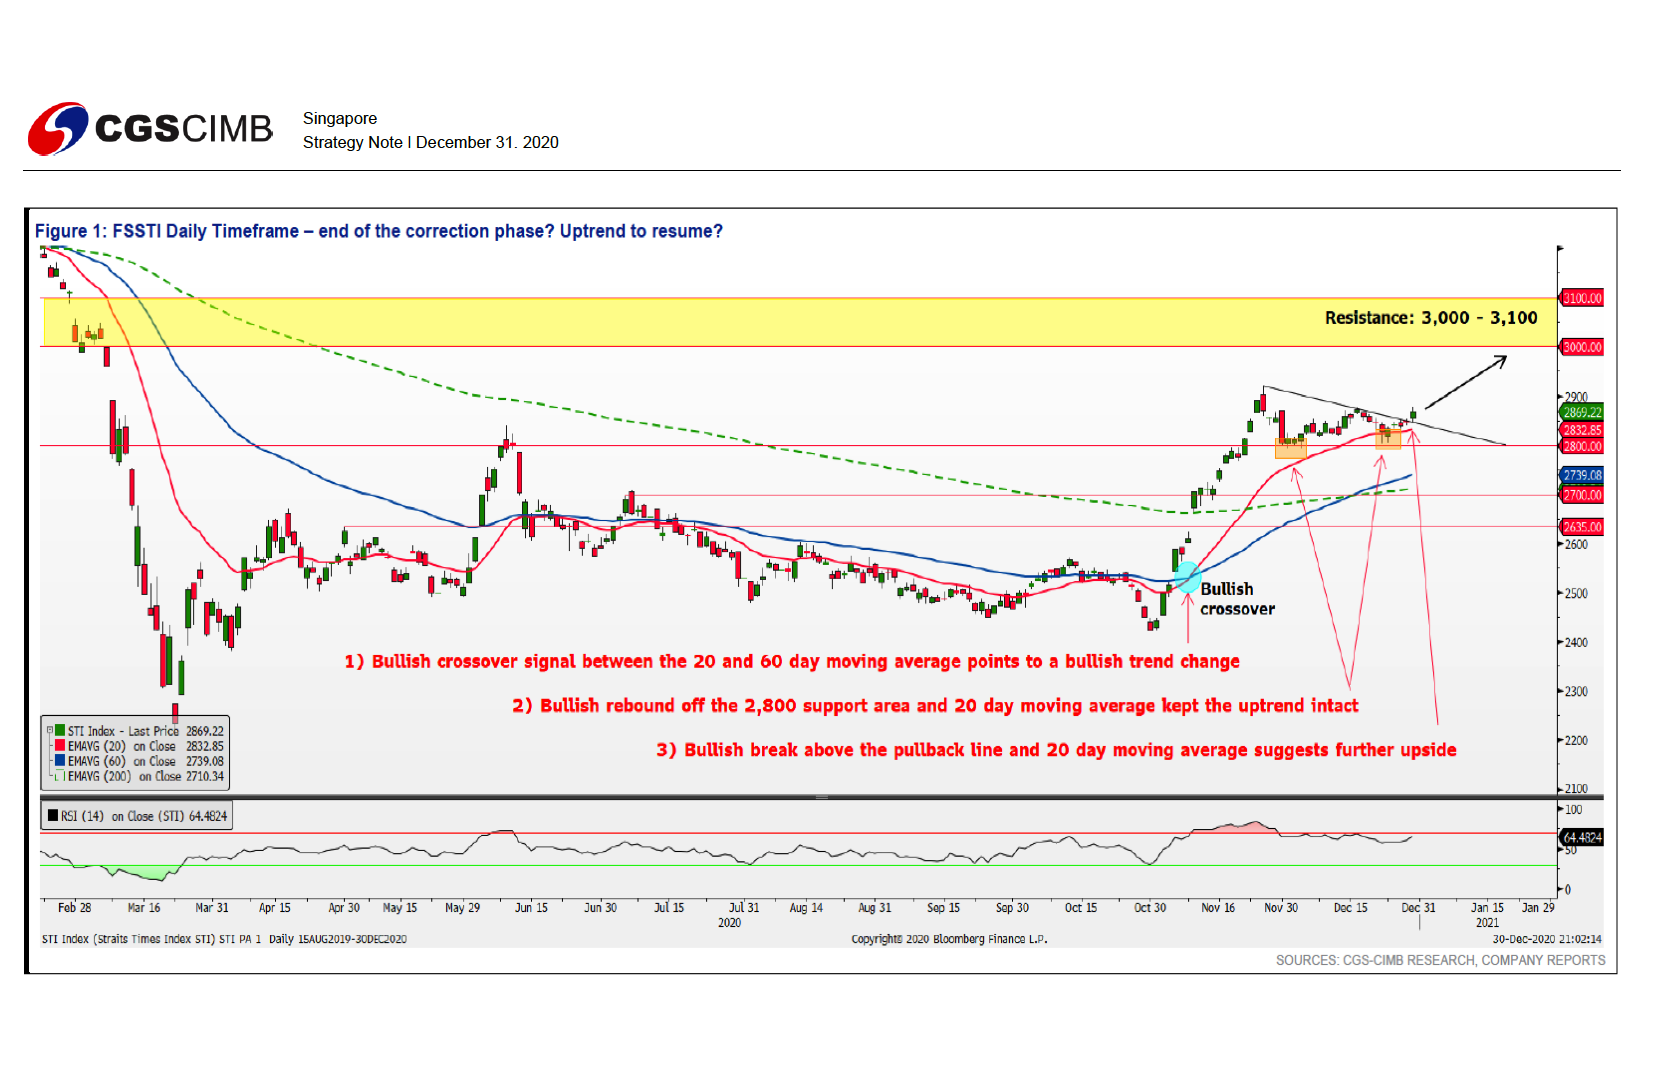 Singapore Market Strategy - CGS-CIMB Research | SGinvestors.io